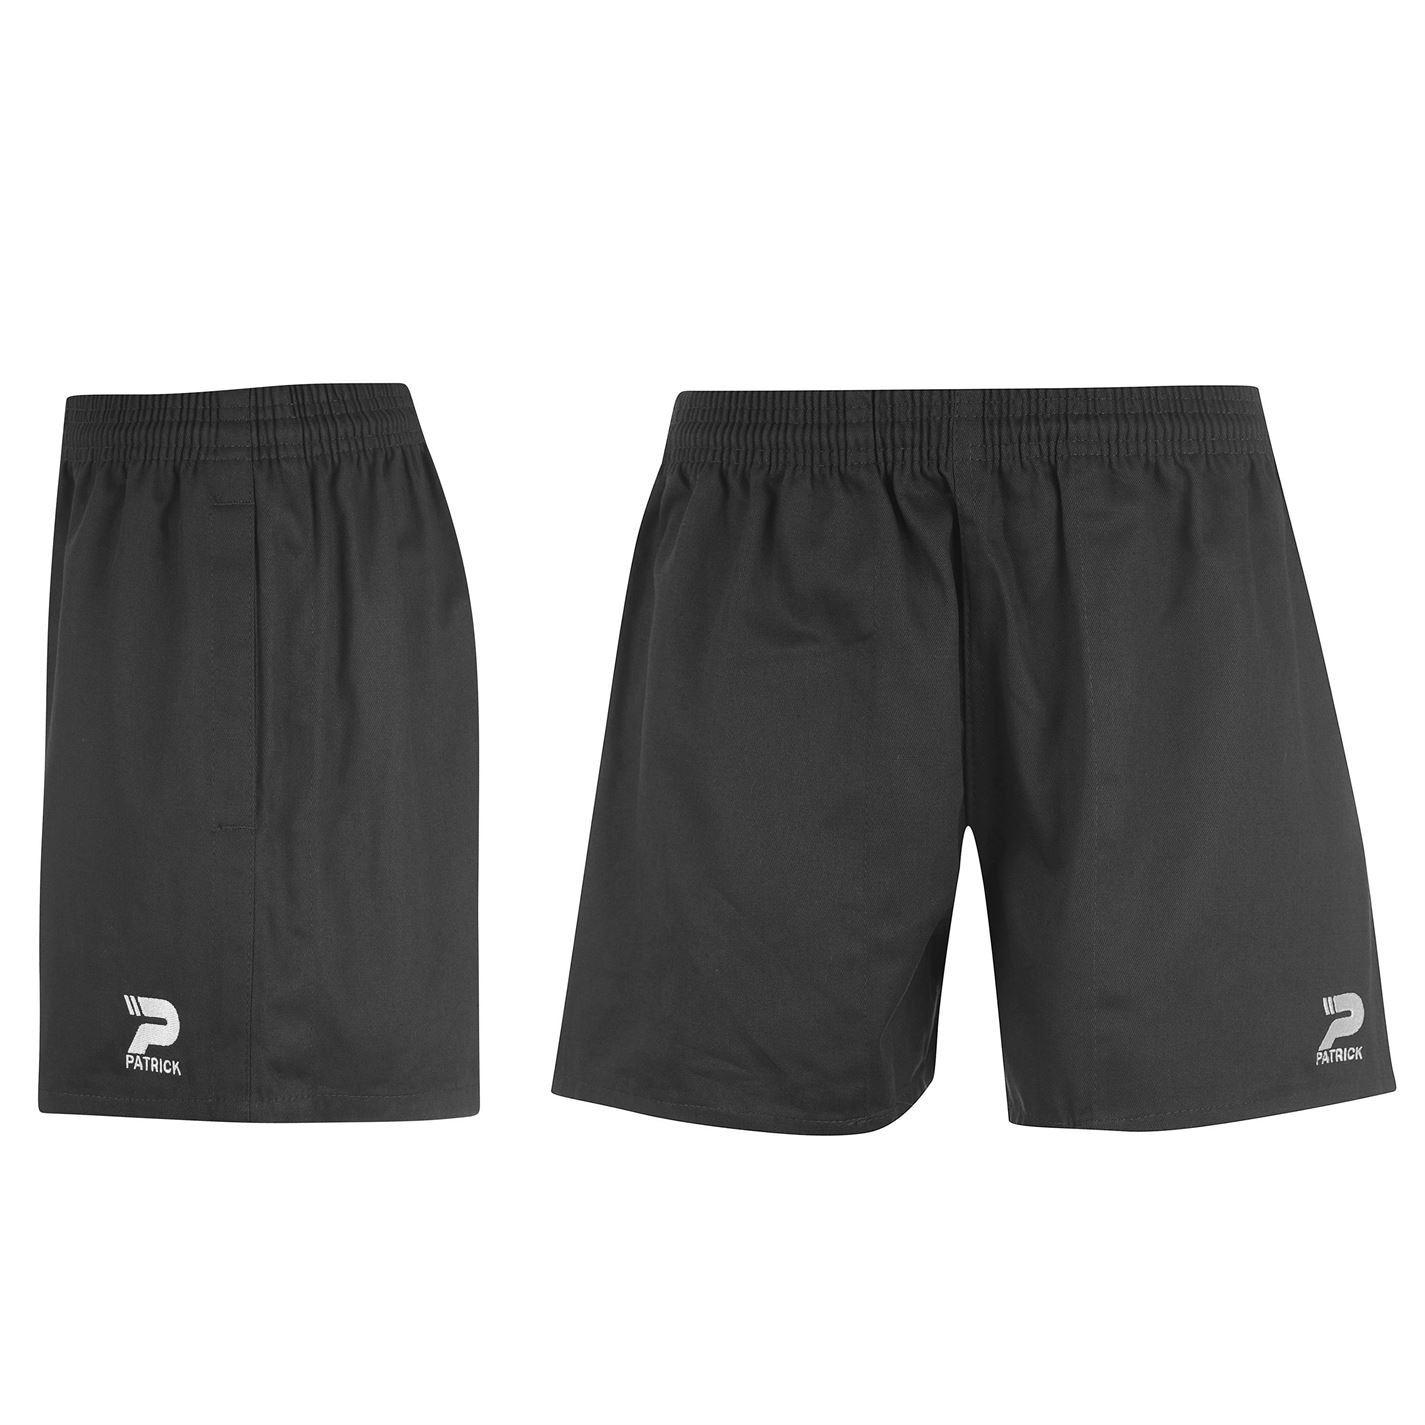 Patrick-Rugby-Shorts-Junior-Boys-Sports-Fan-Bottoms thumbnail 4